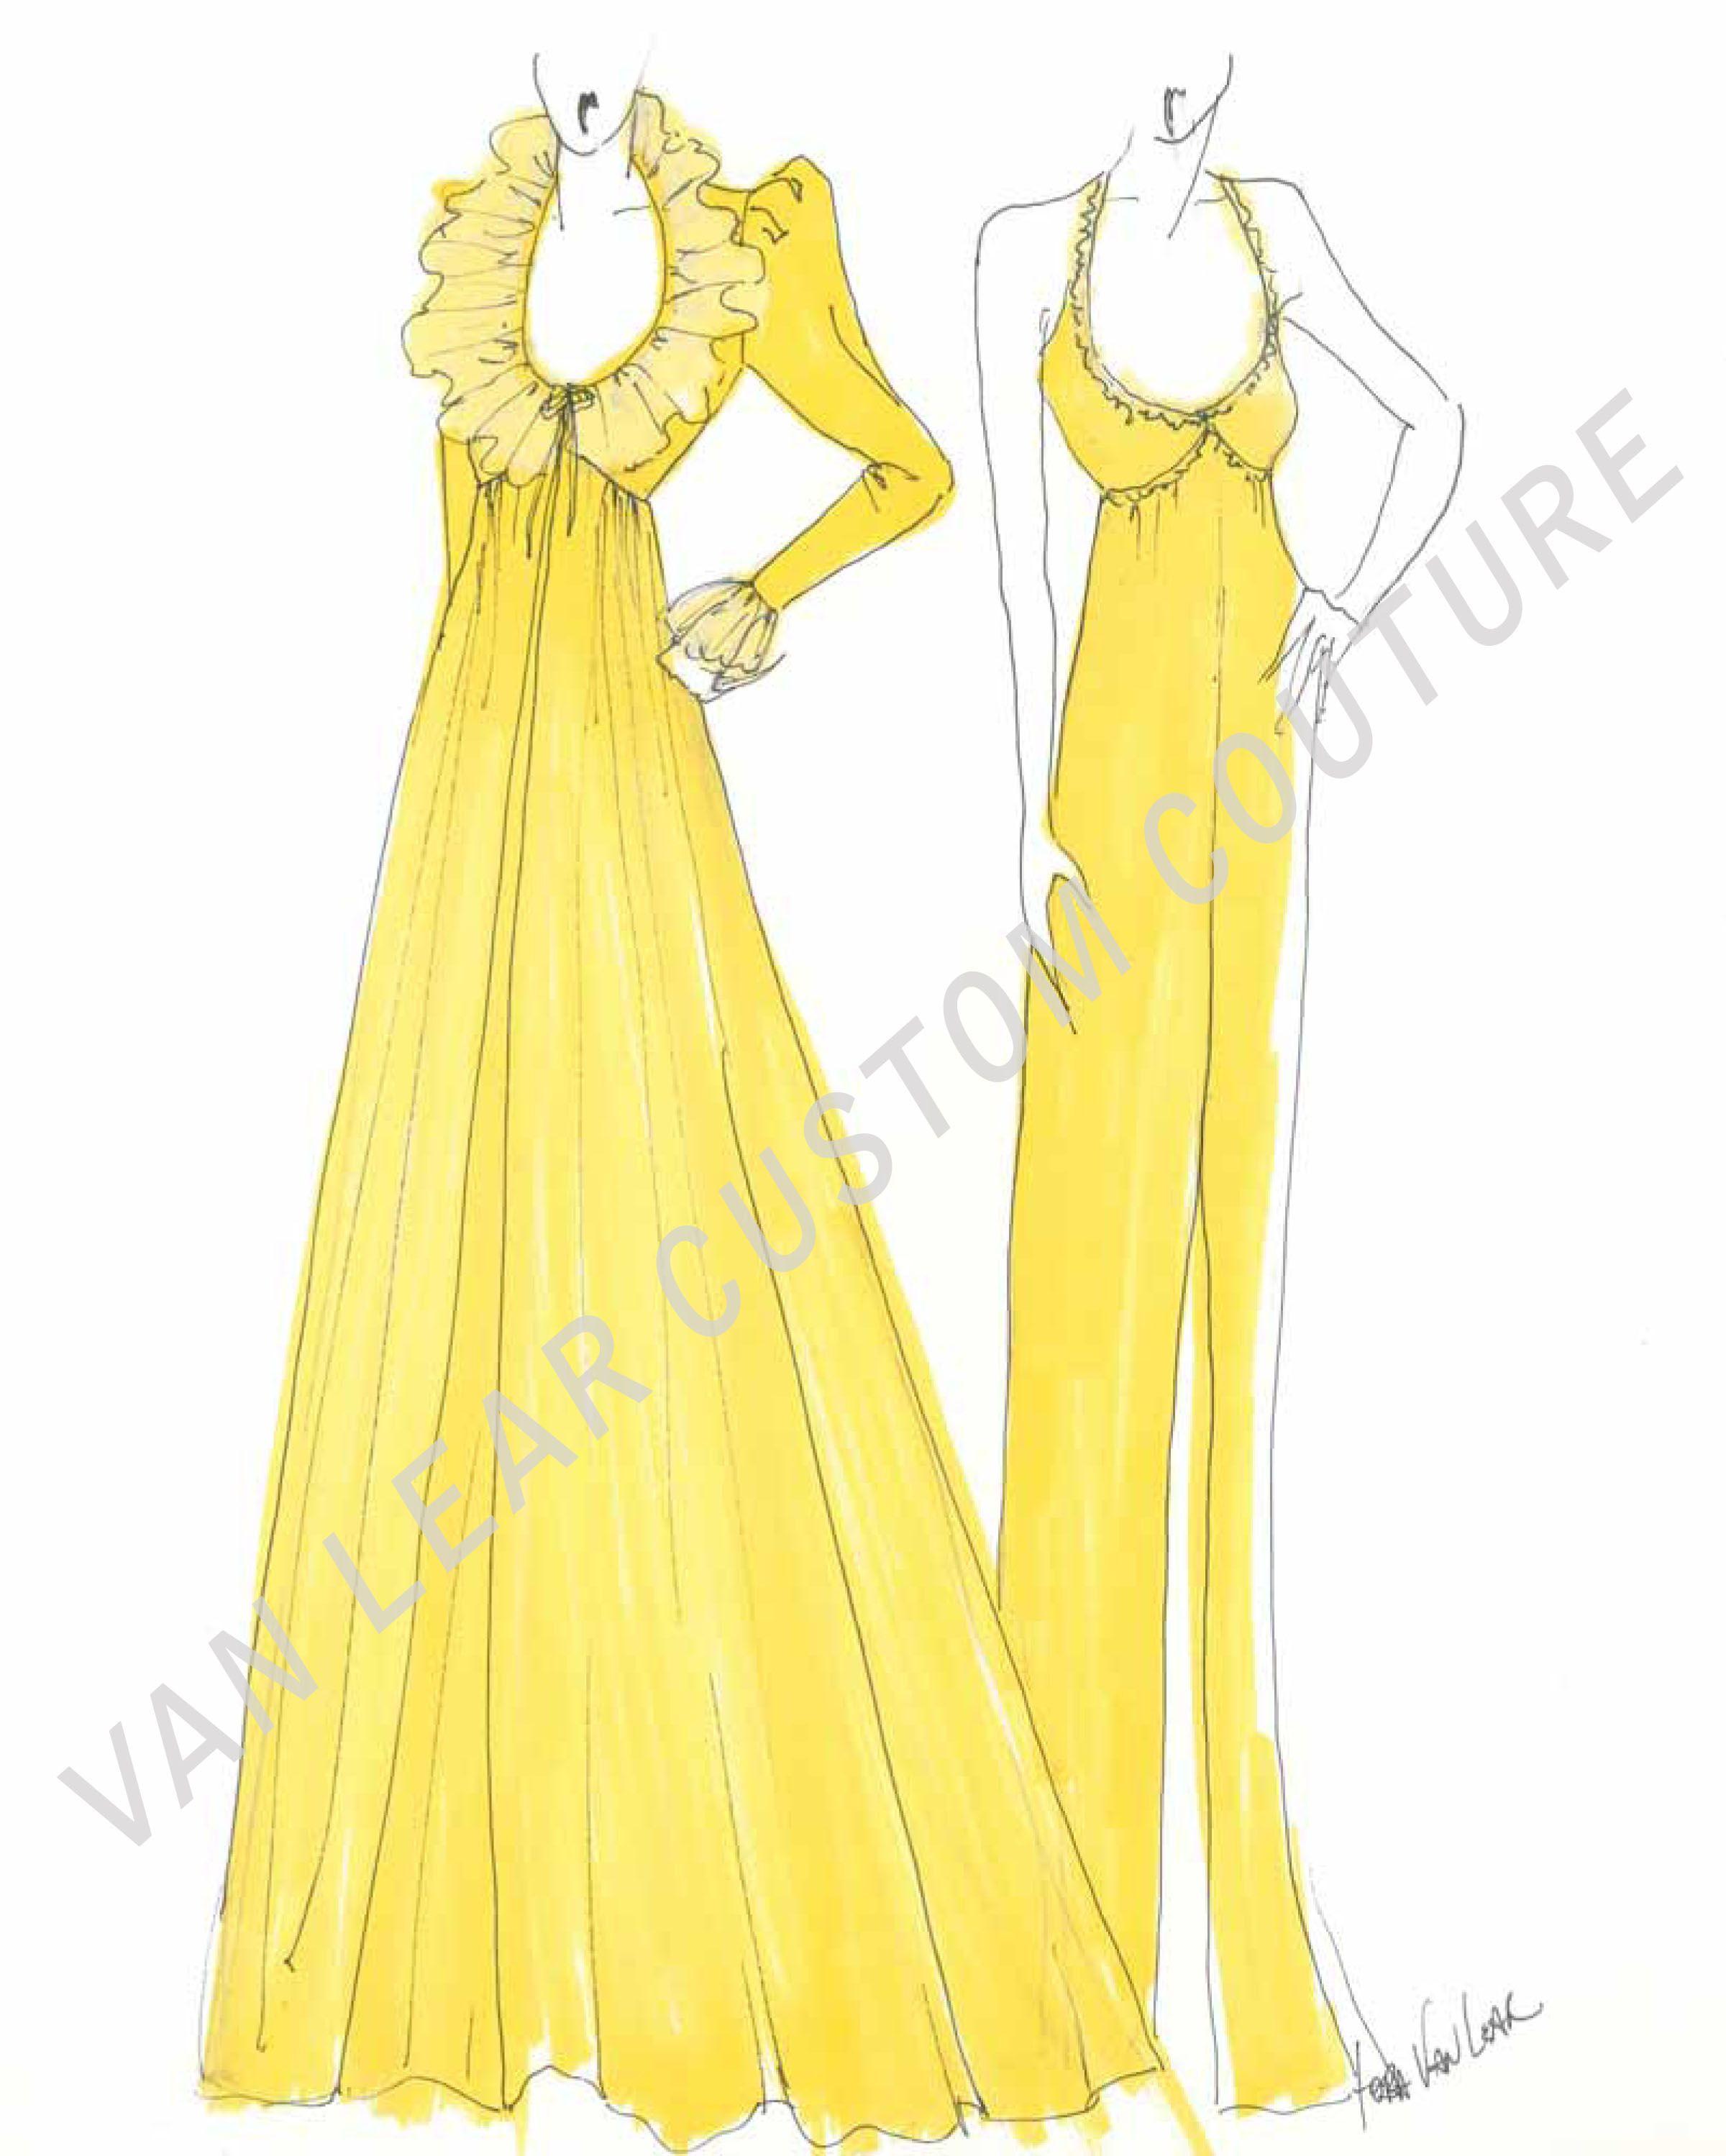 Vintage Fashion Illustration Quick Croquis Done By Lora Vanlear Fashion Designer Specializi Fashion Illustration Fashion Design Fashion Illustration Vintage